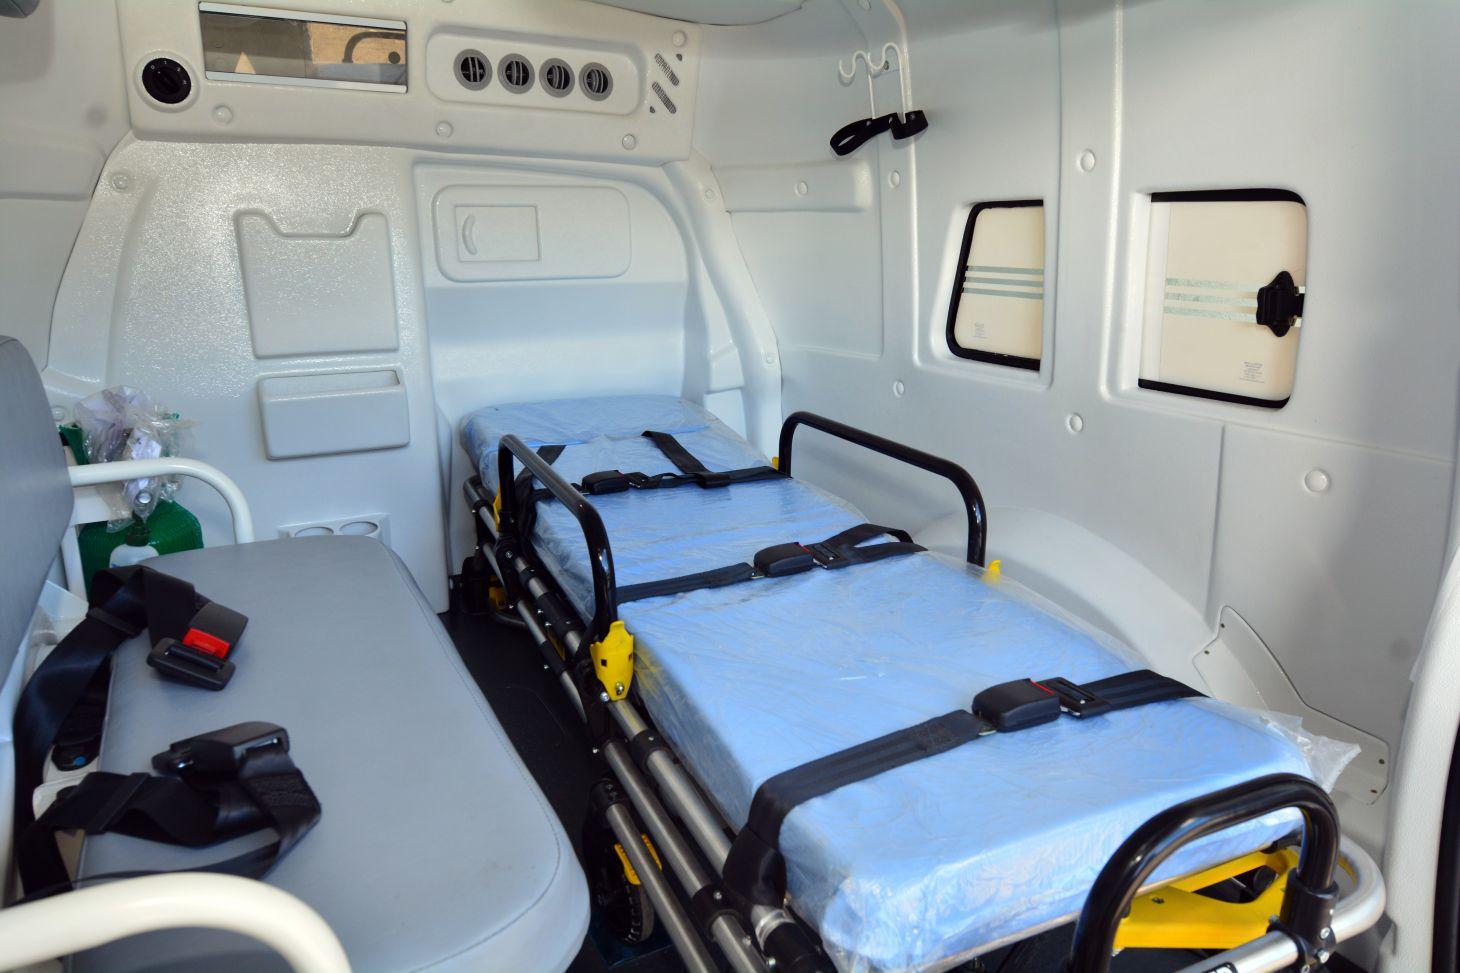 fiat fiorino ambulancia interior maca e equipamentos de atendimento